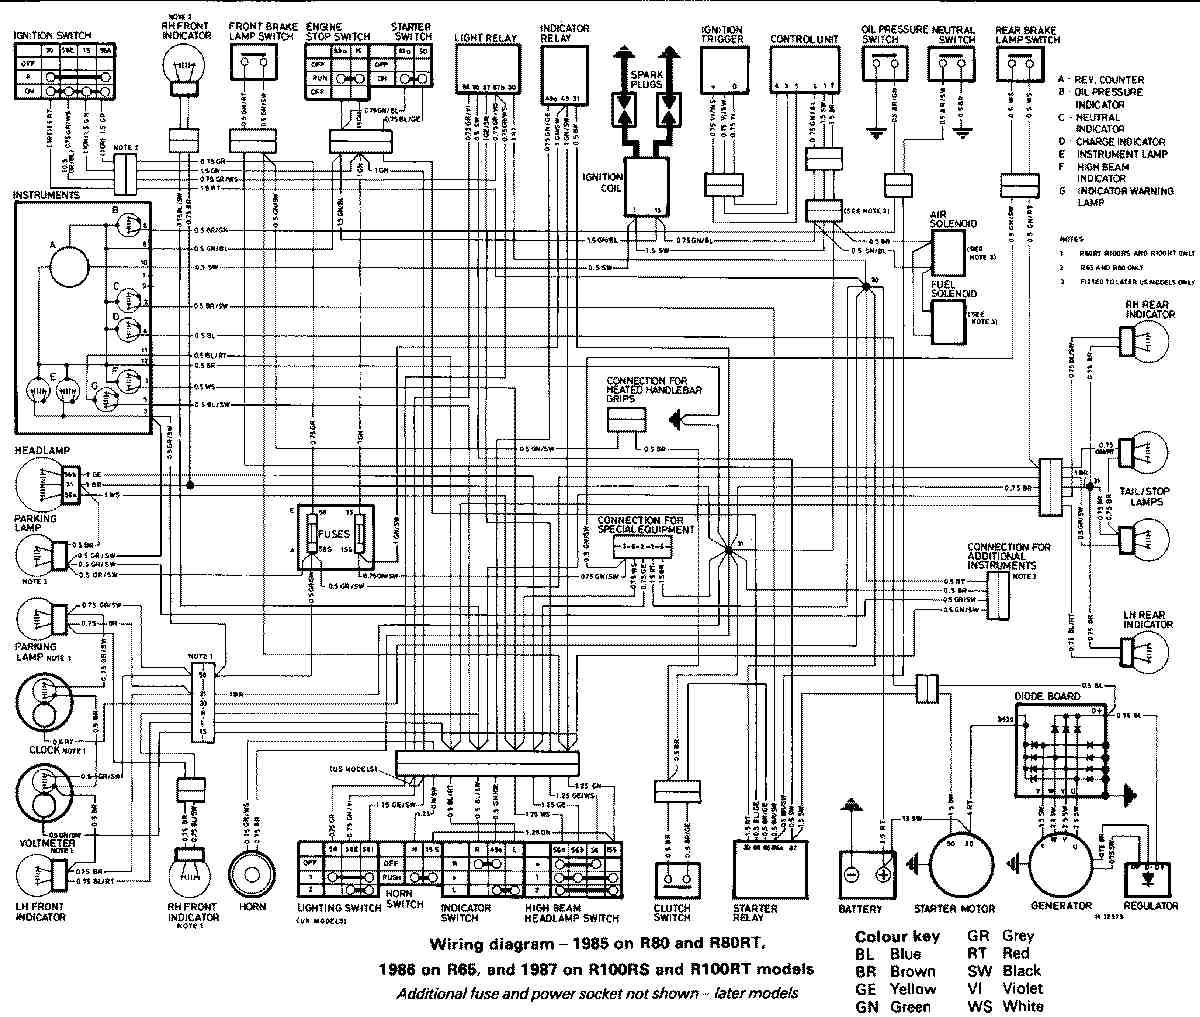 2002 Bmw E46 Electrical Diagrams - Wiring Library • Insweb.co